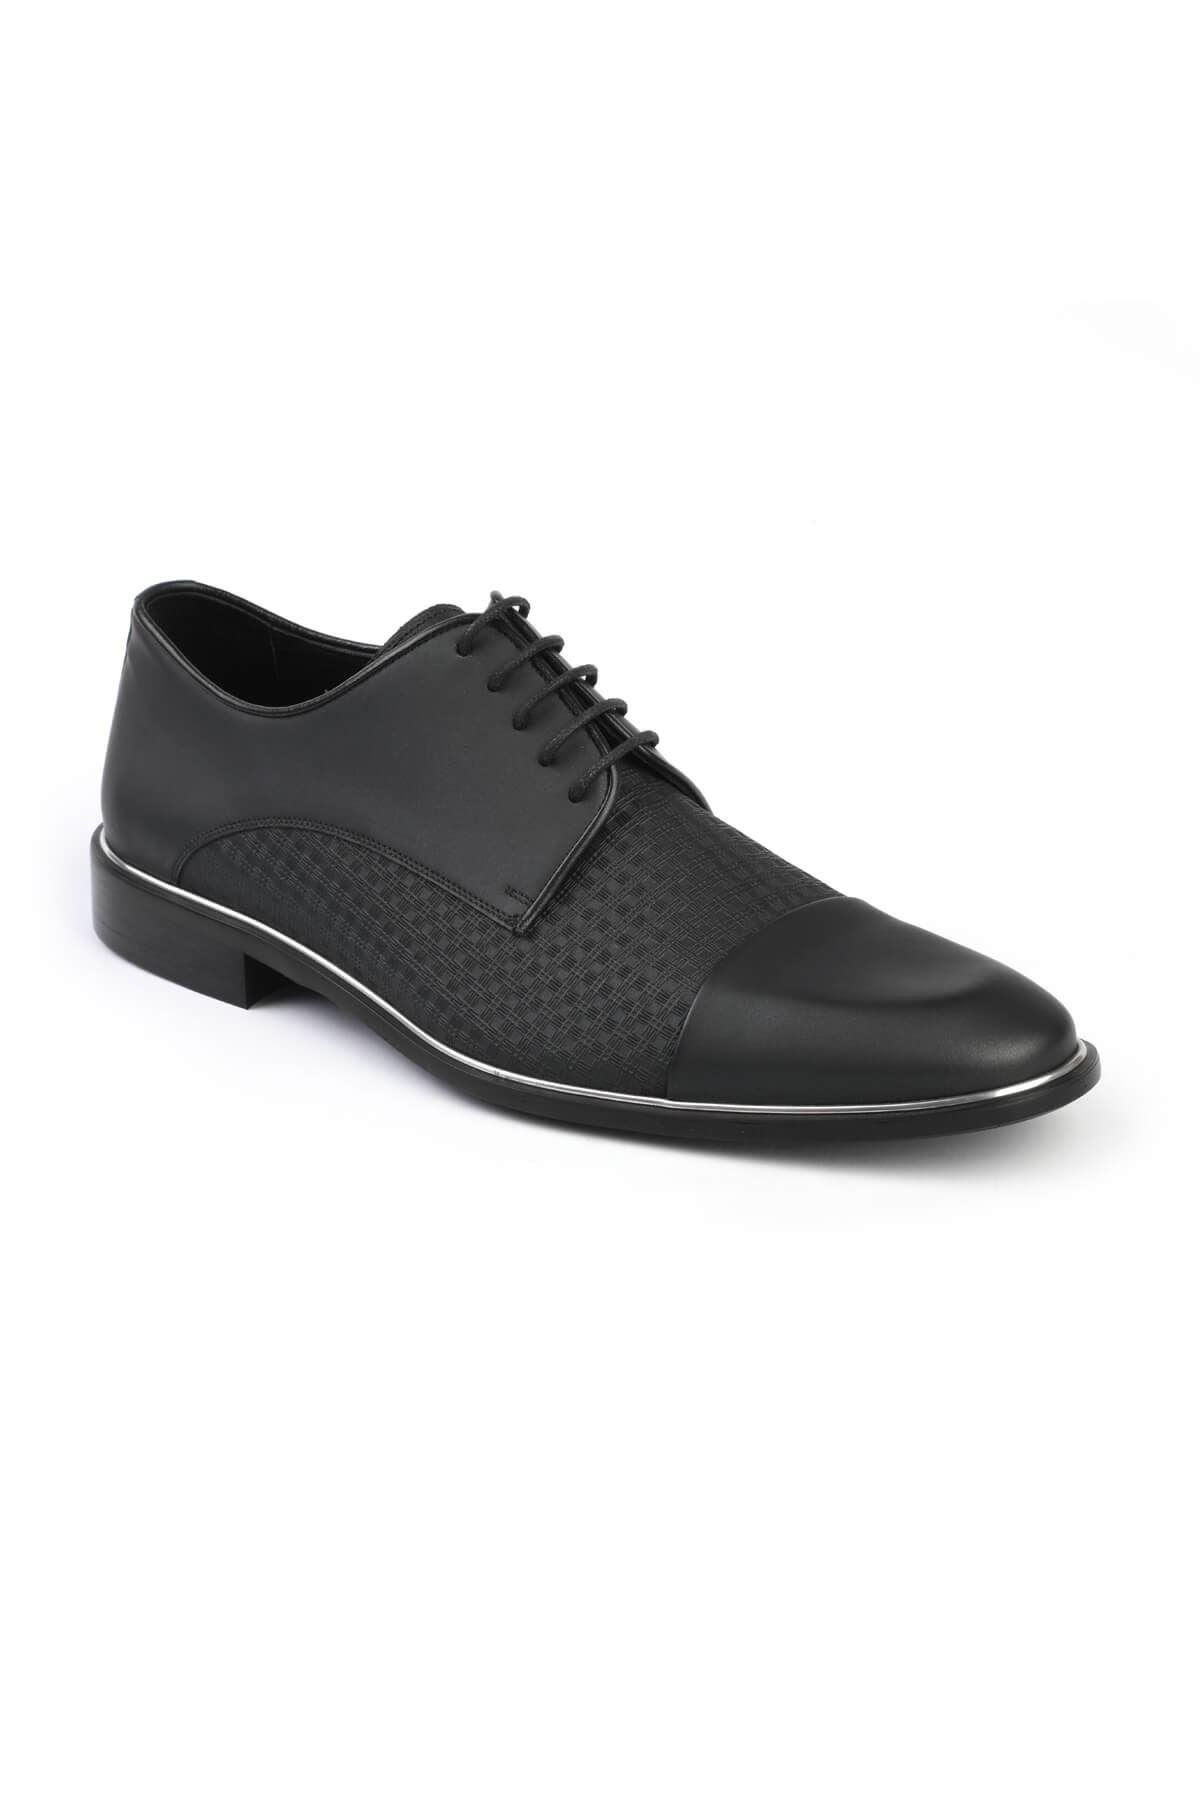 Libero 2983 Black Classic Shoes